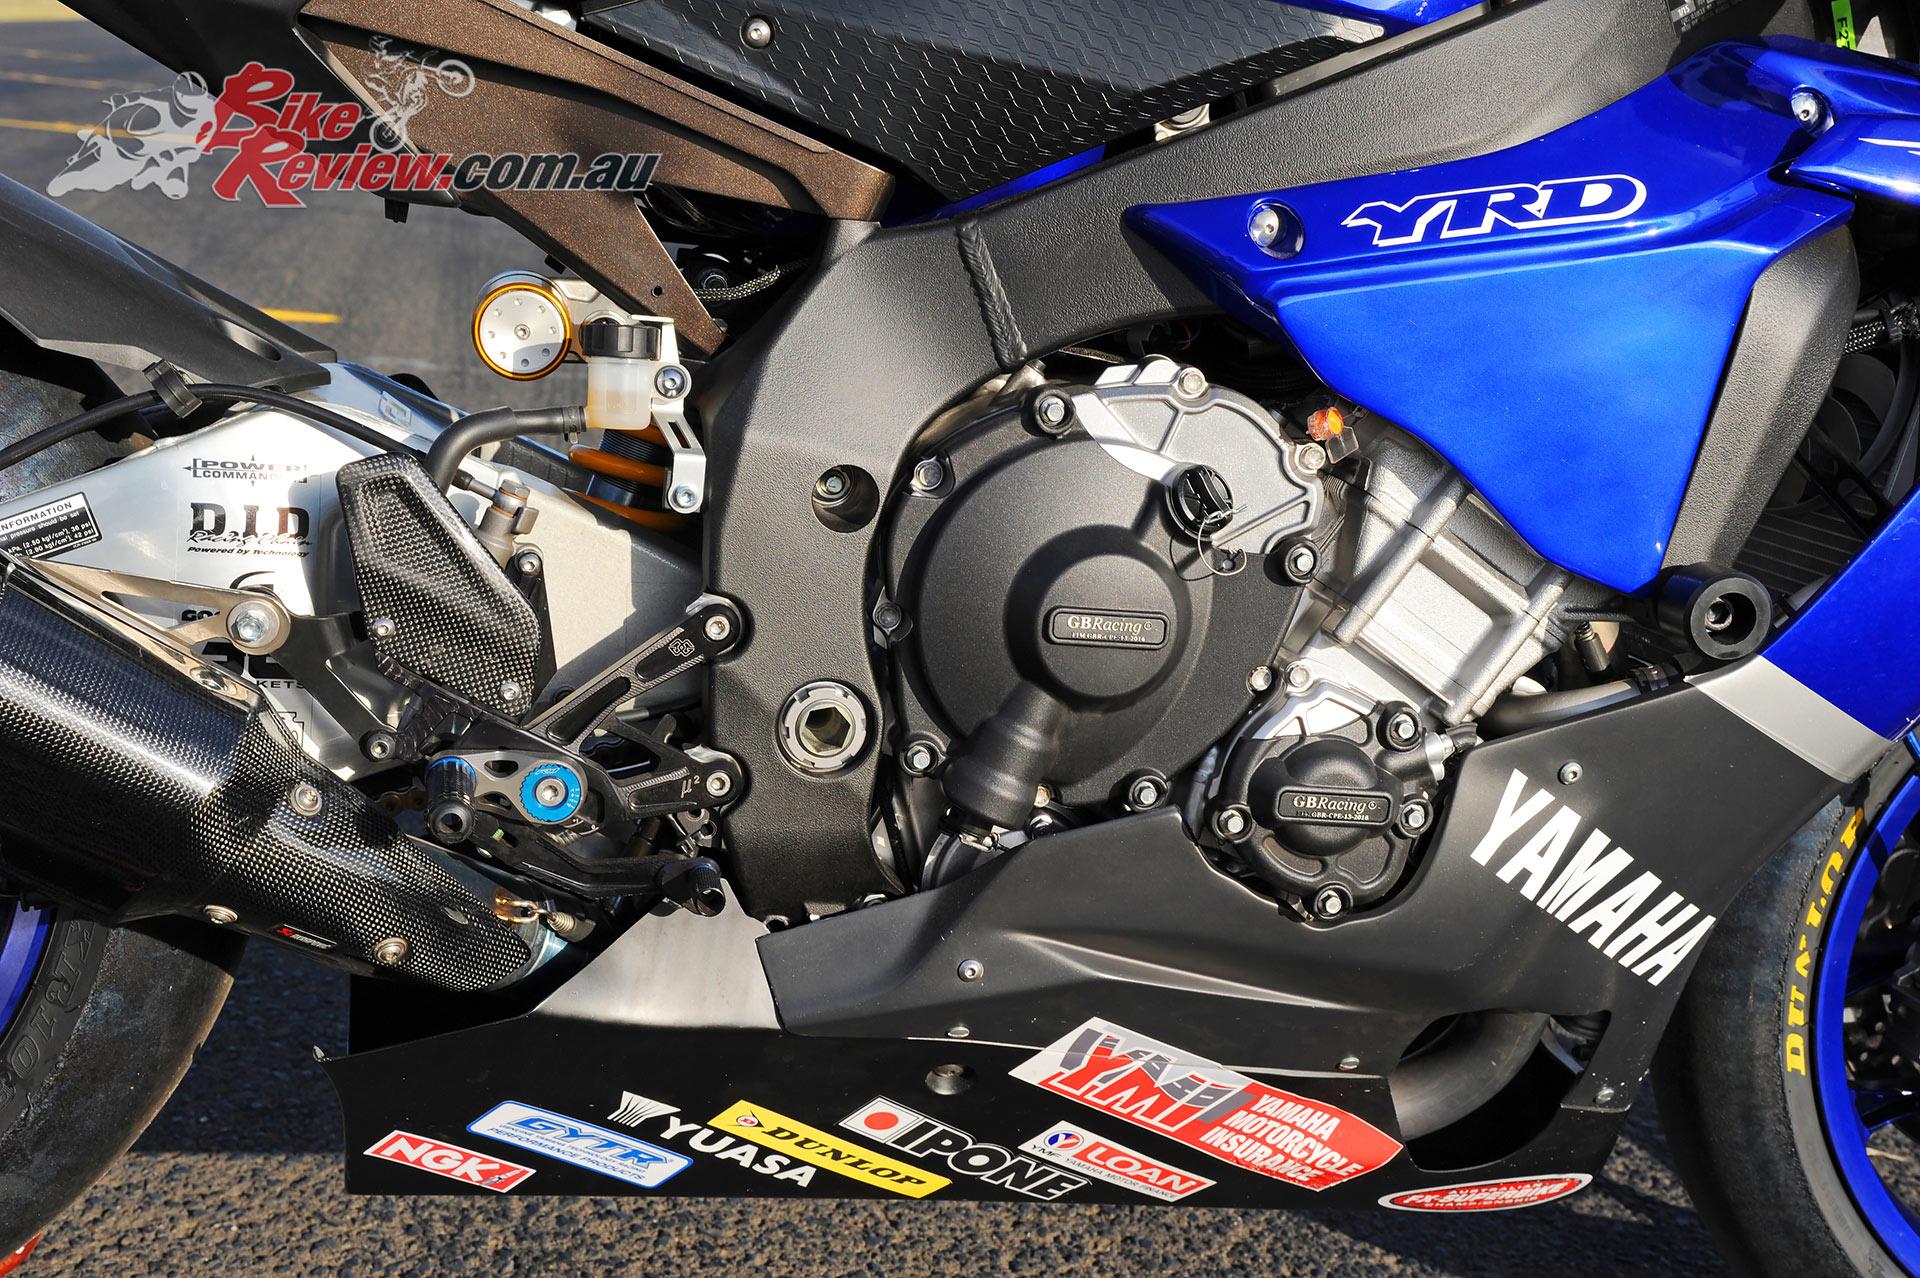 Wayne Maxwells YRT Yamaha YZF R1